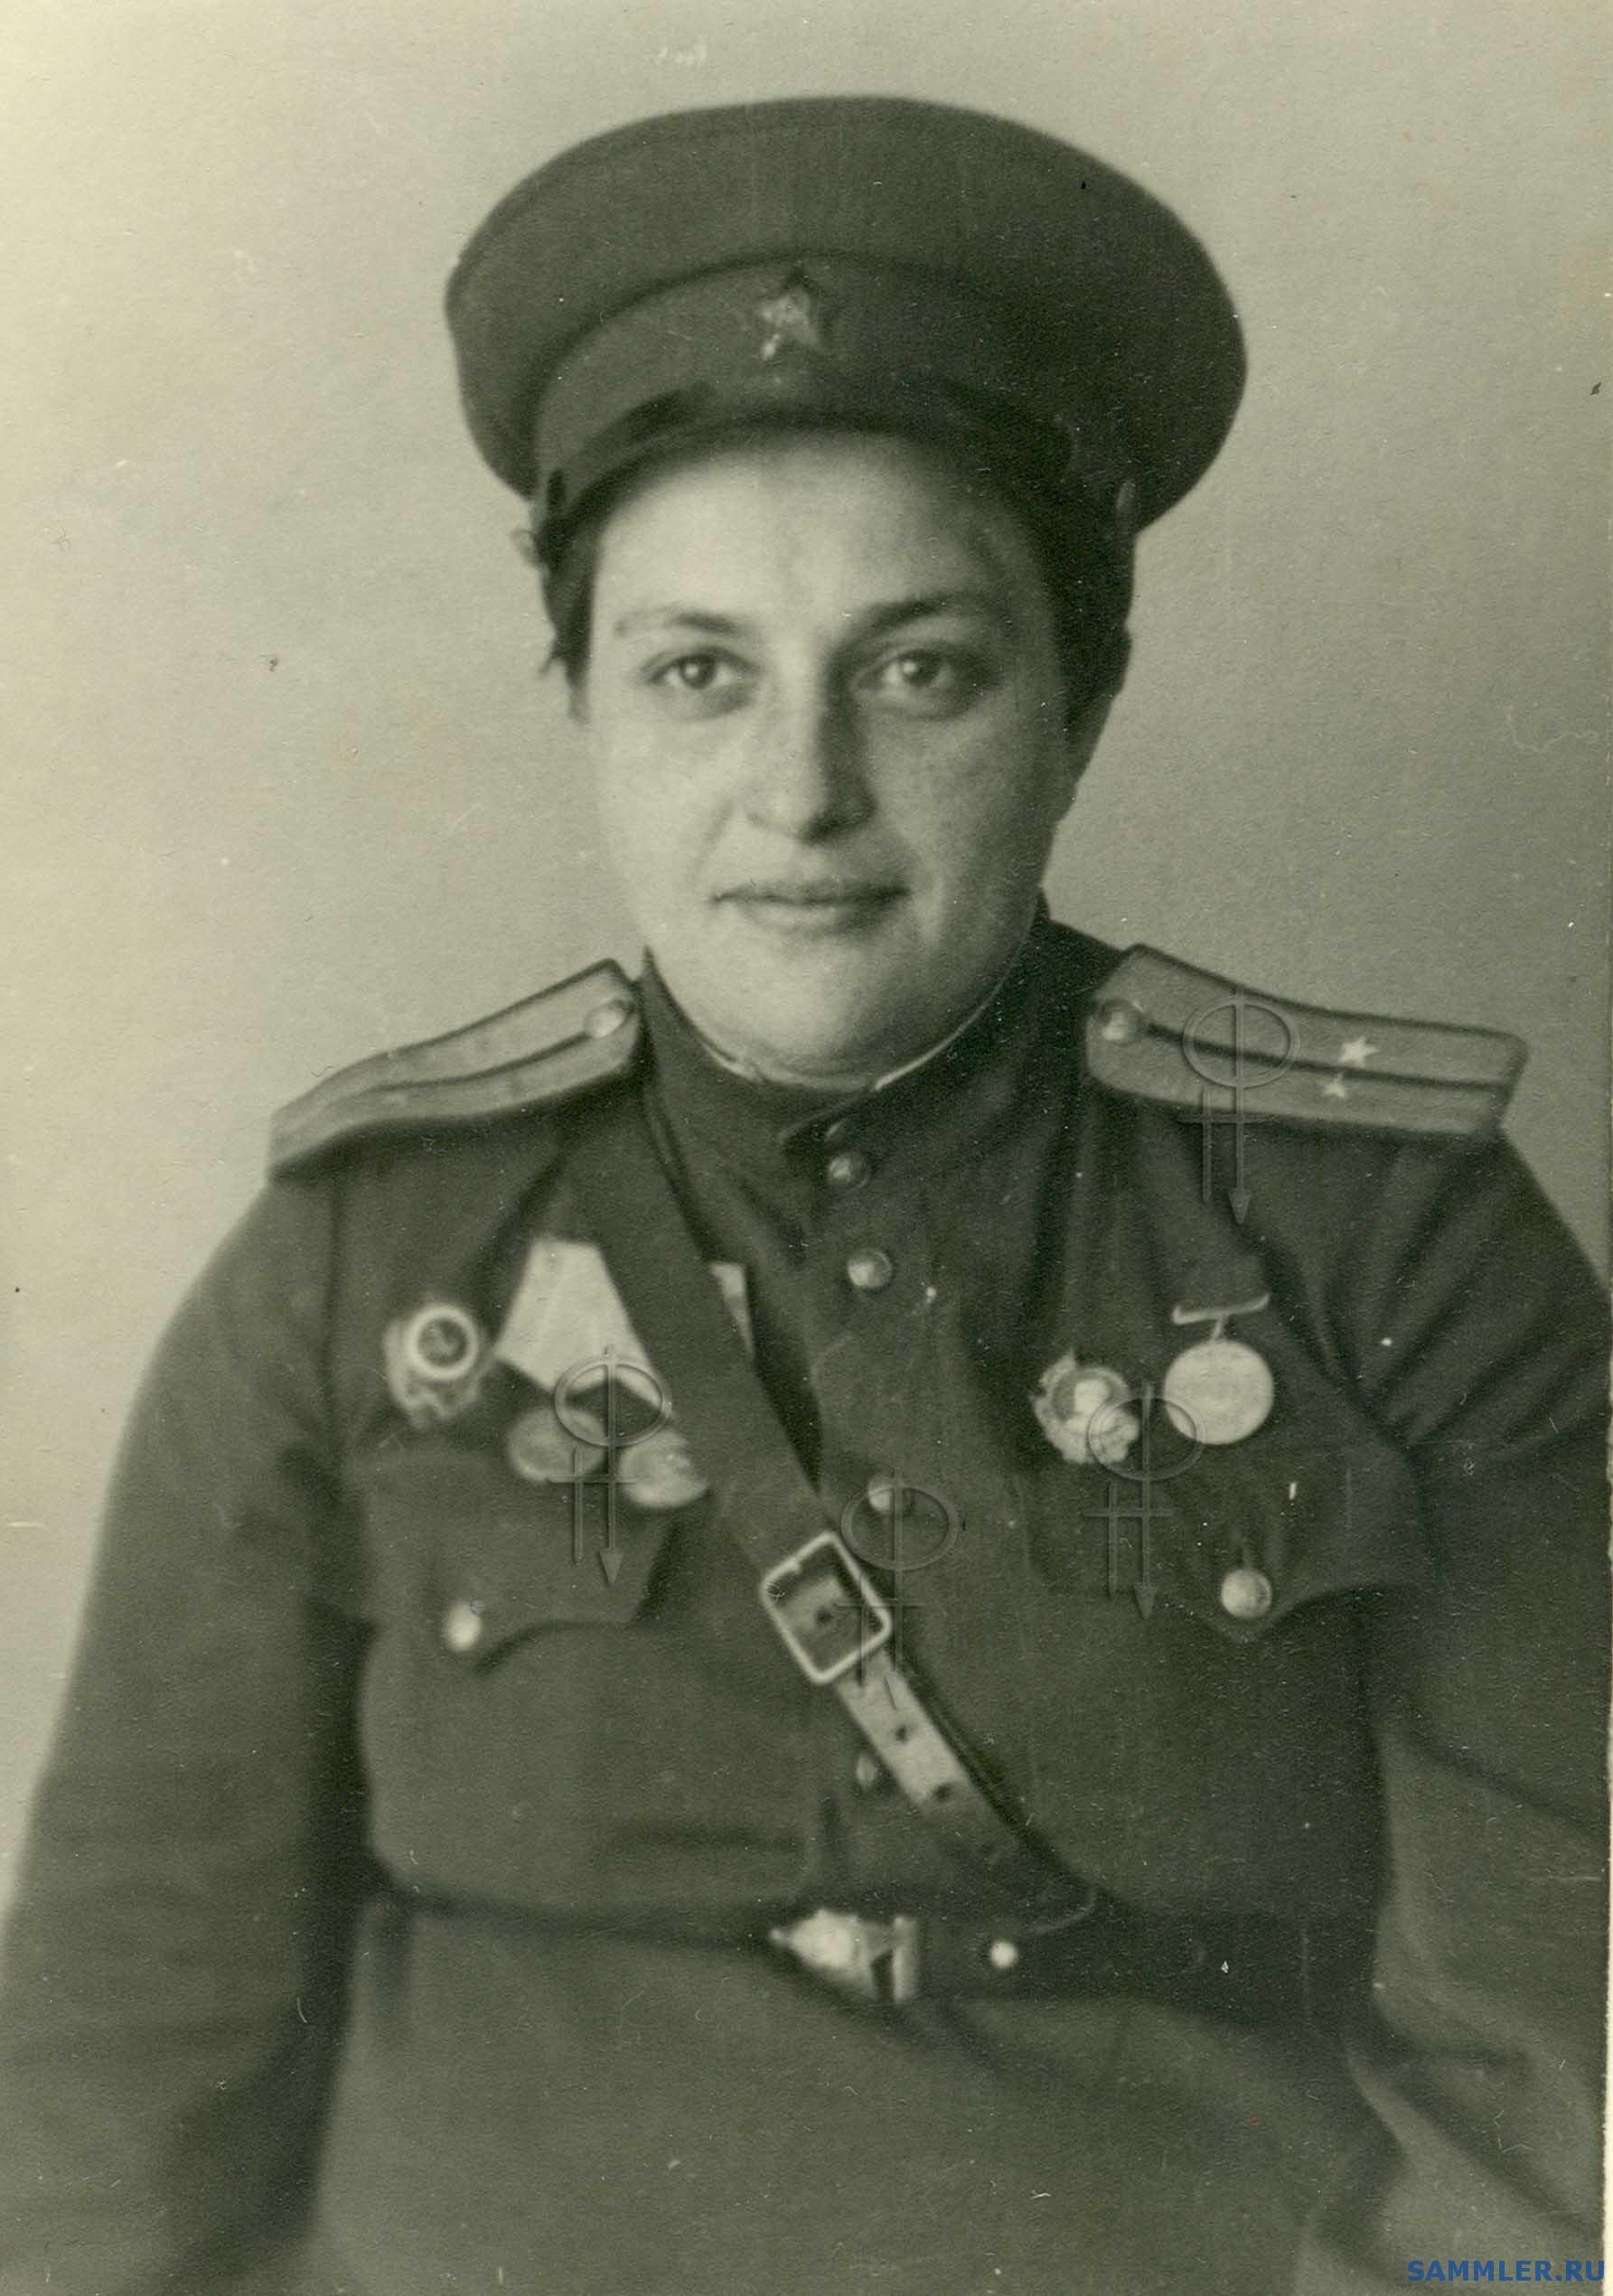 Павлюченко людмила её дети фото